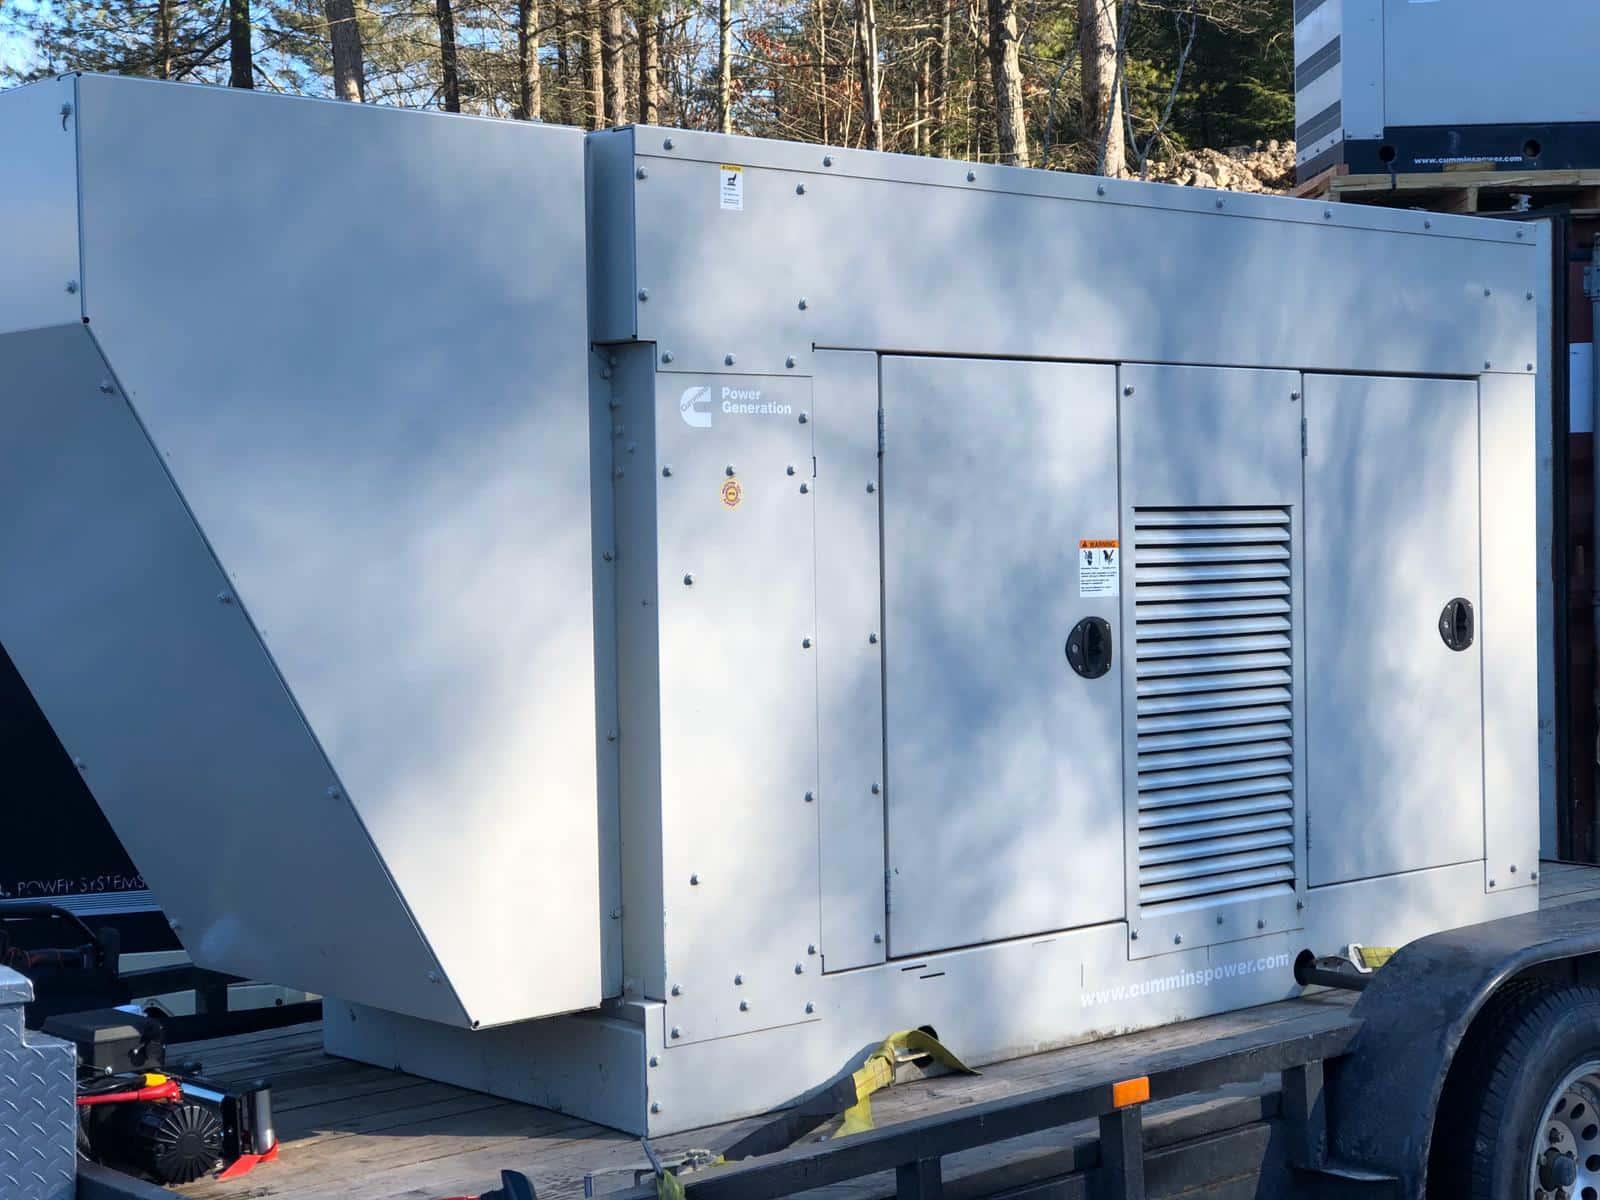 Used 100 kW Cummins GGHH Natural Gas Generator – JUST IN!